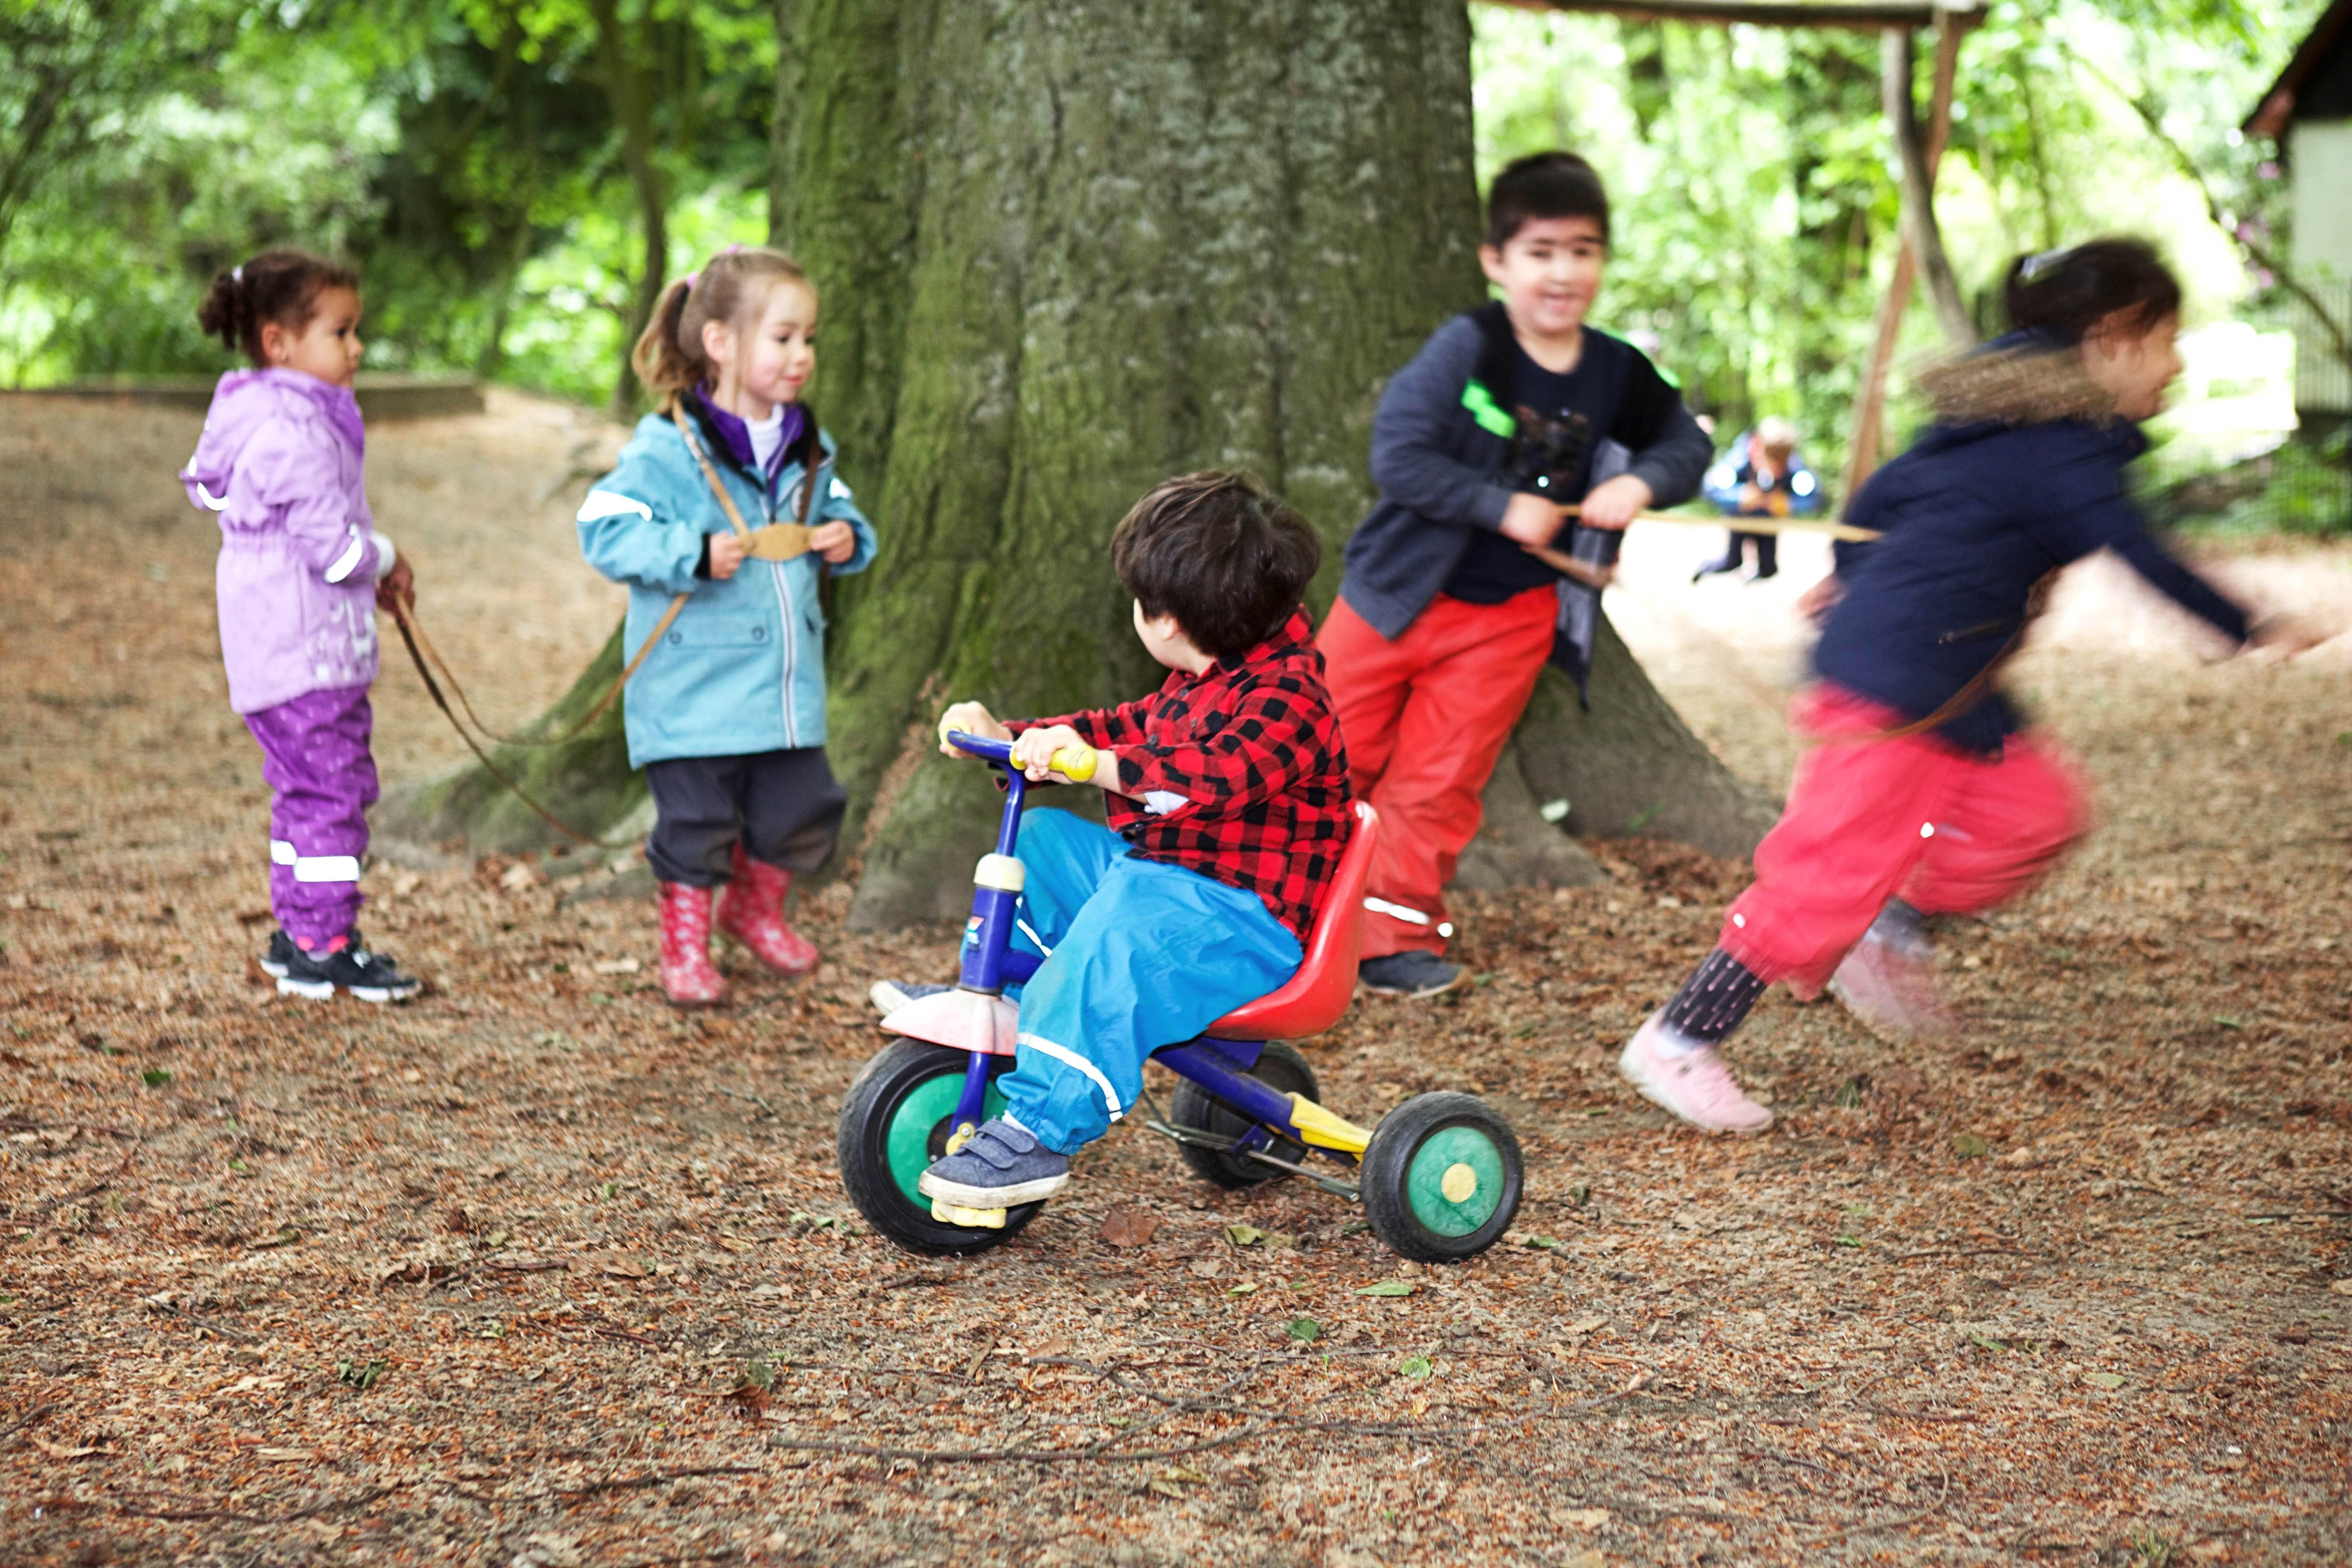 Kindertagesstätte Wurzelkinder Wandsbek Kita Montessori Kontakt